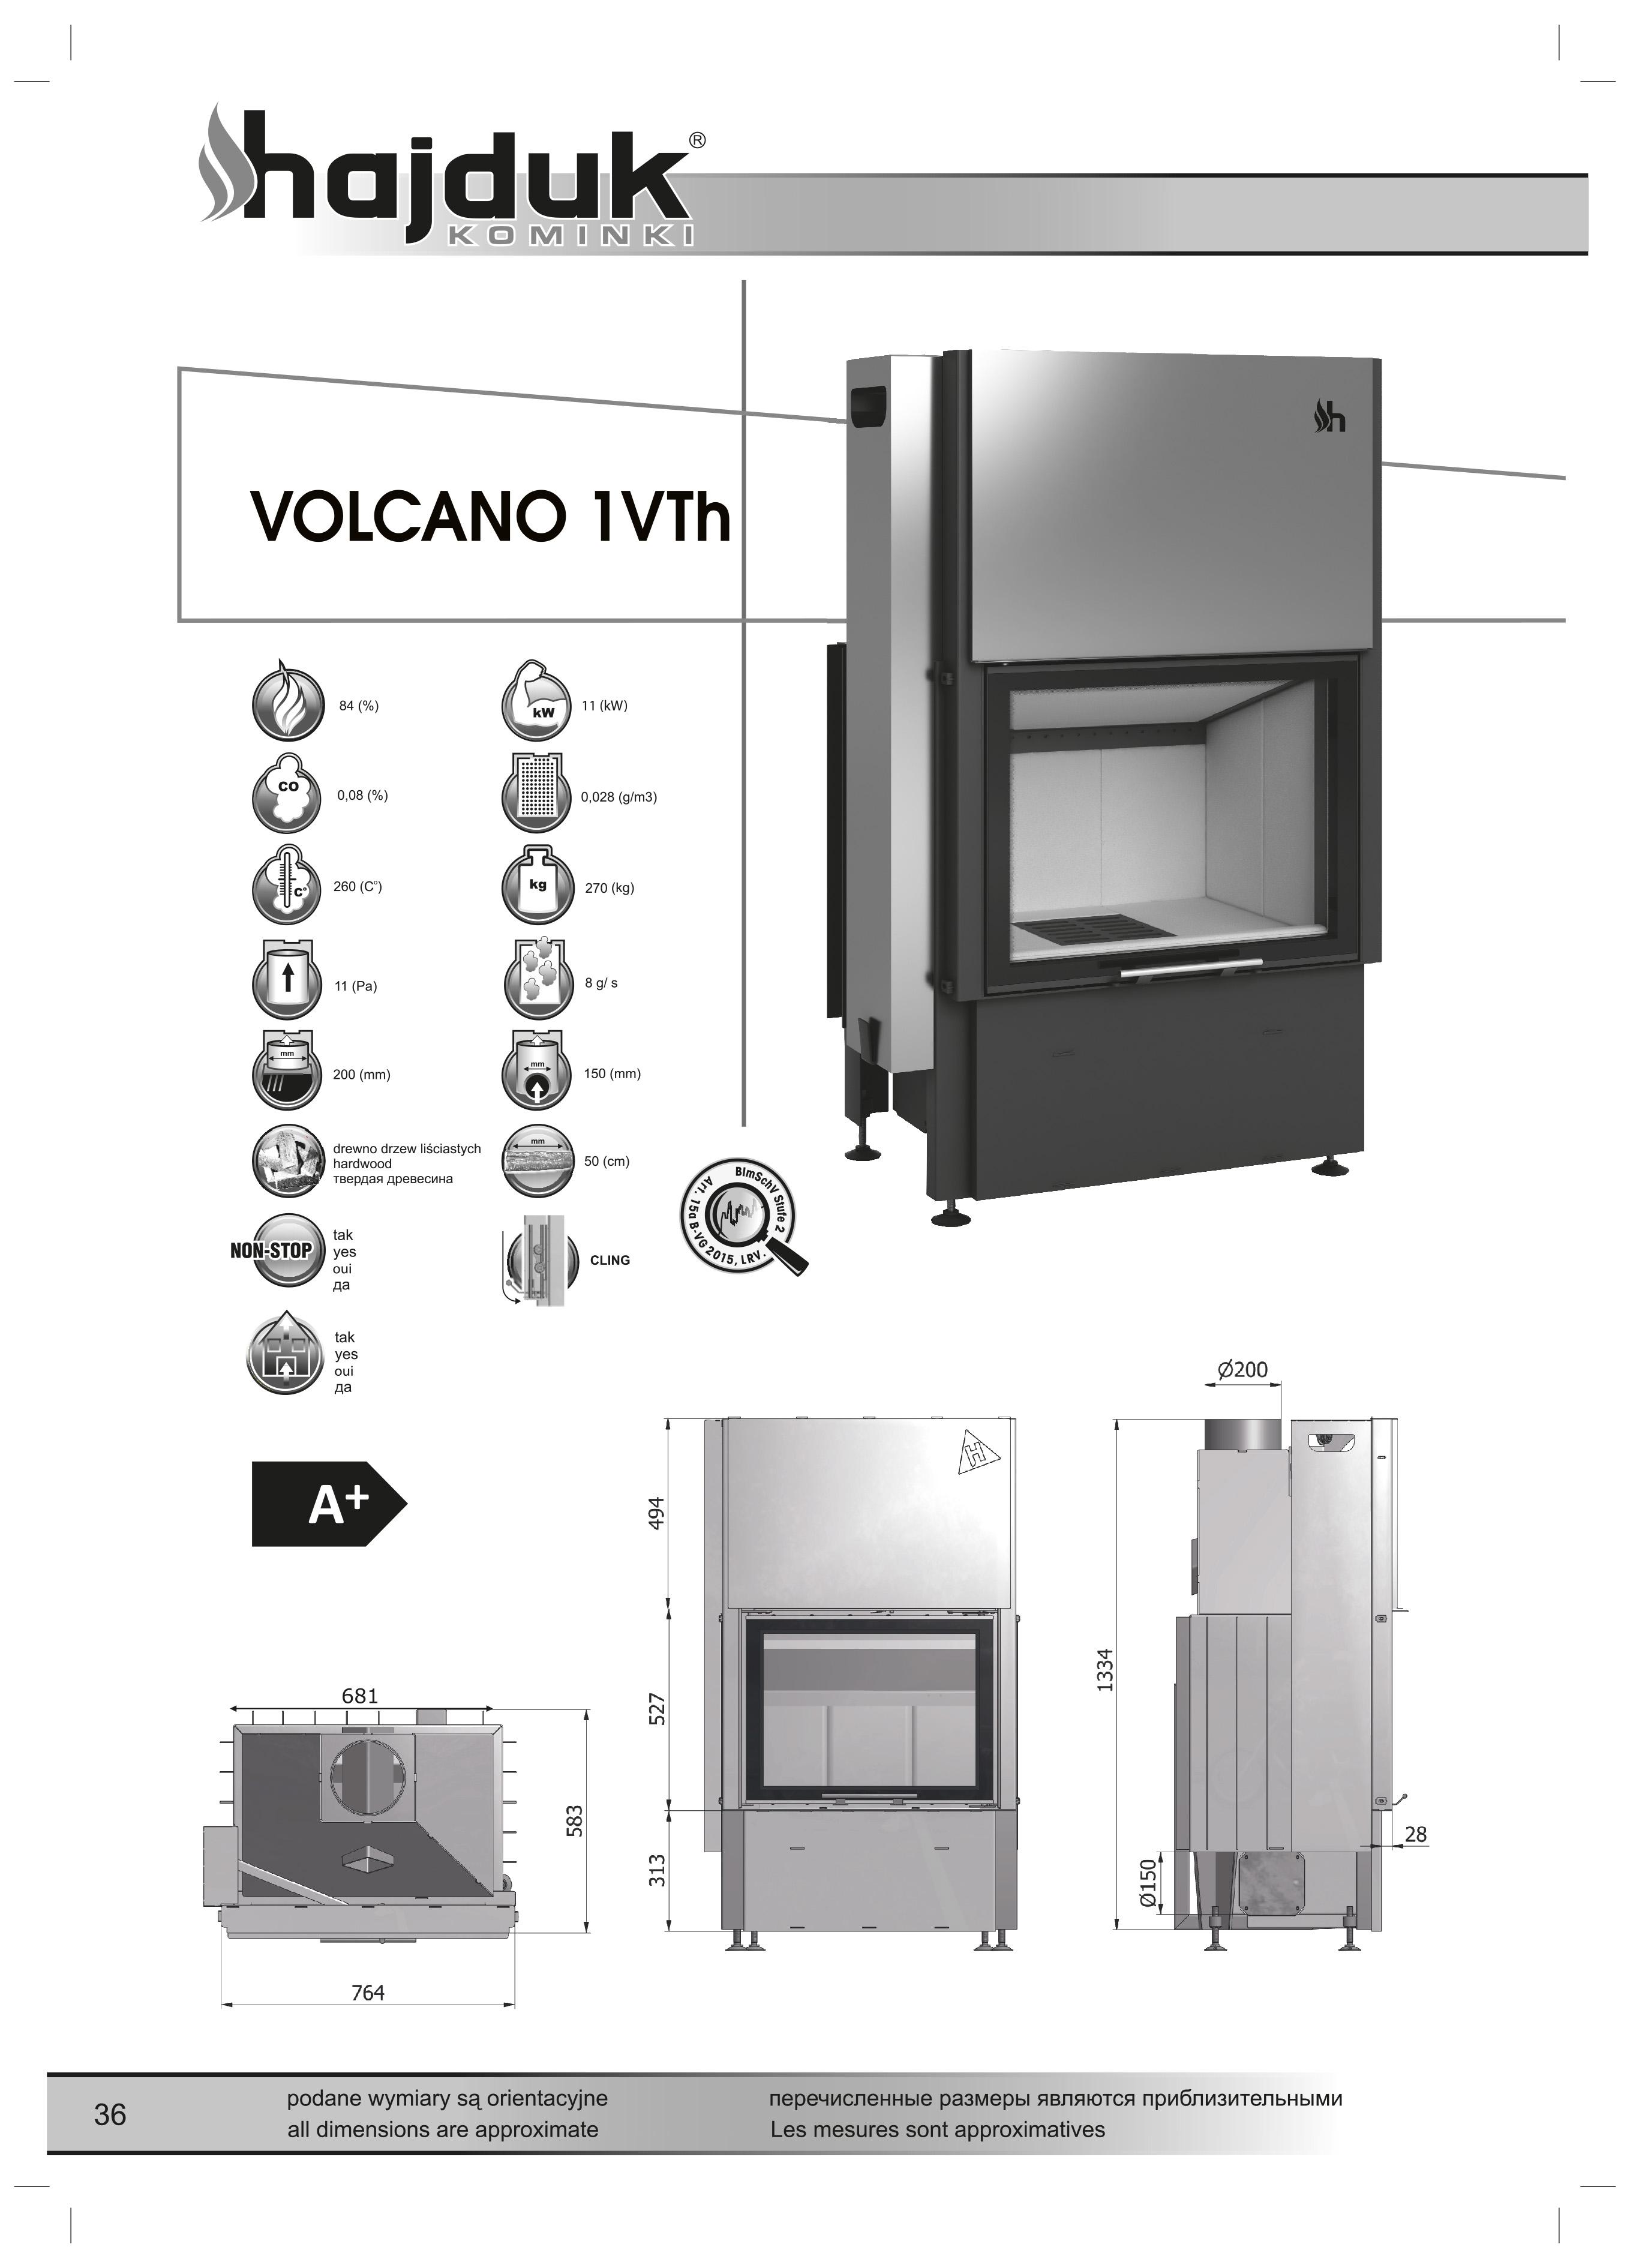 Volcano%201VTh%20 %20karta%20techniczna - Fireplace insert Hajduk Volcano 1VTh - frameless door